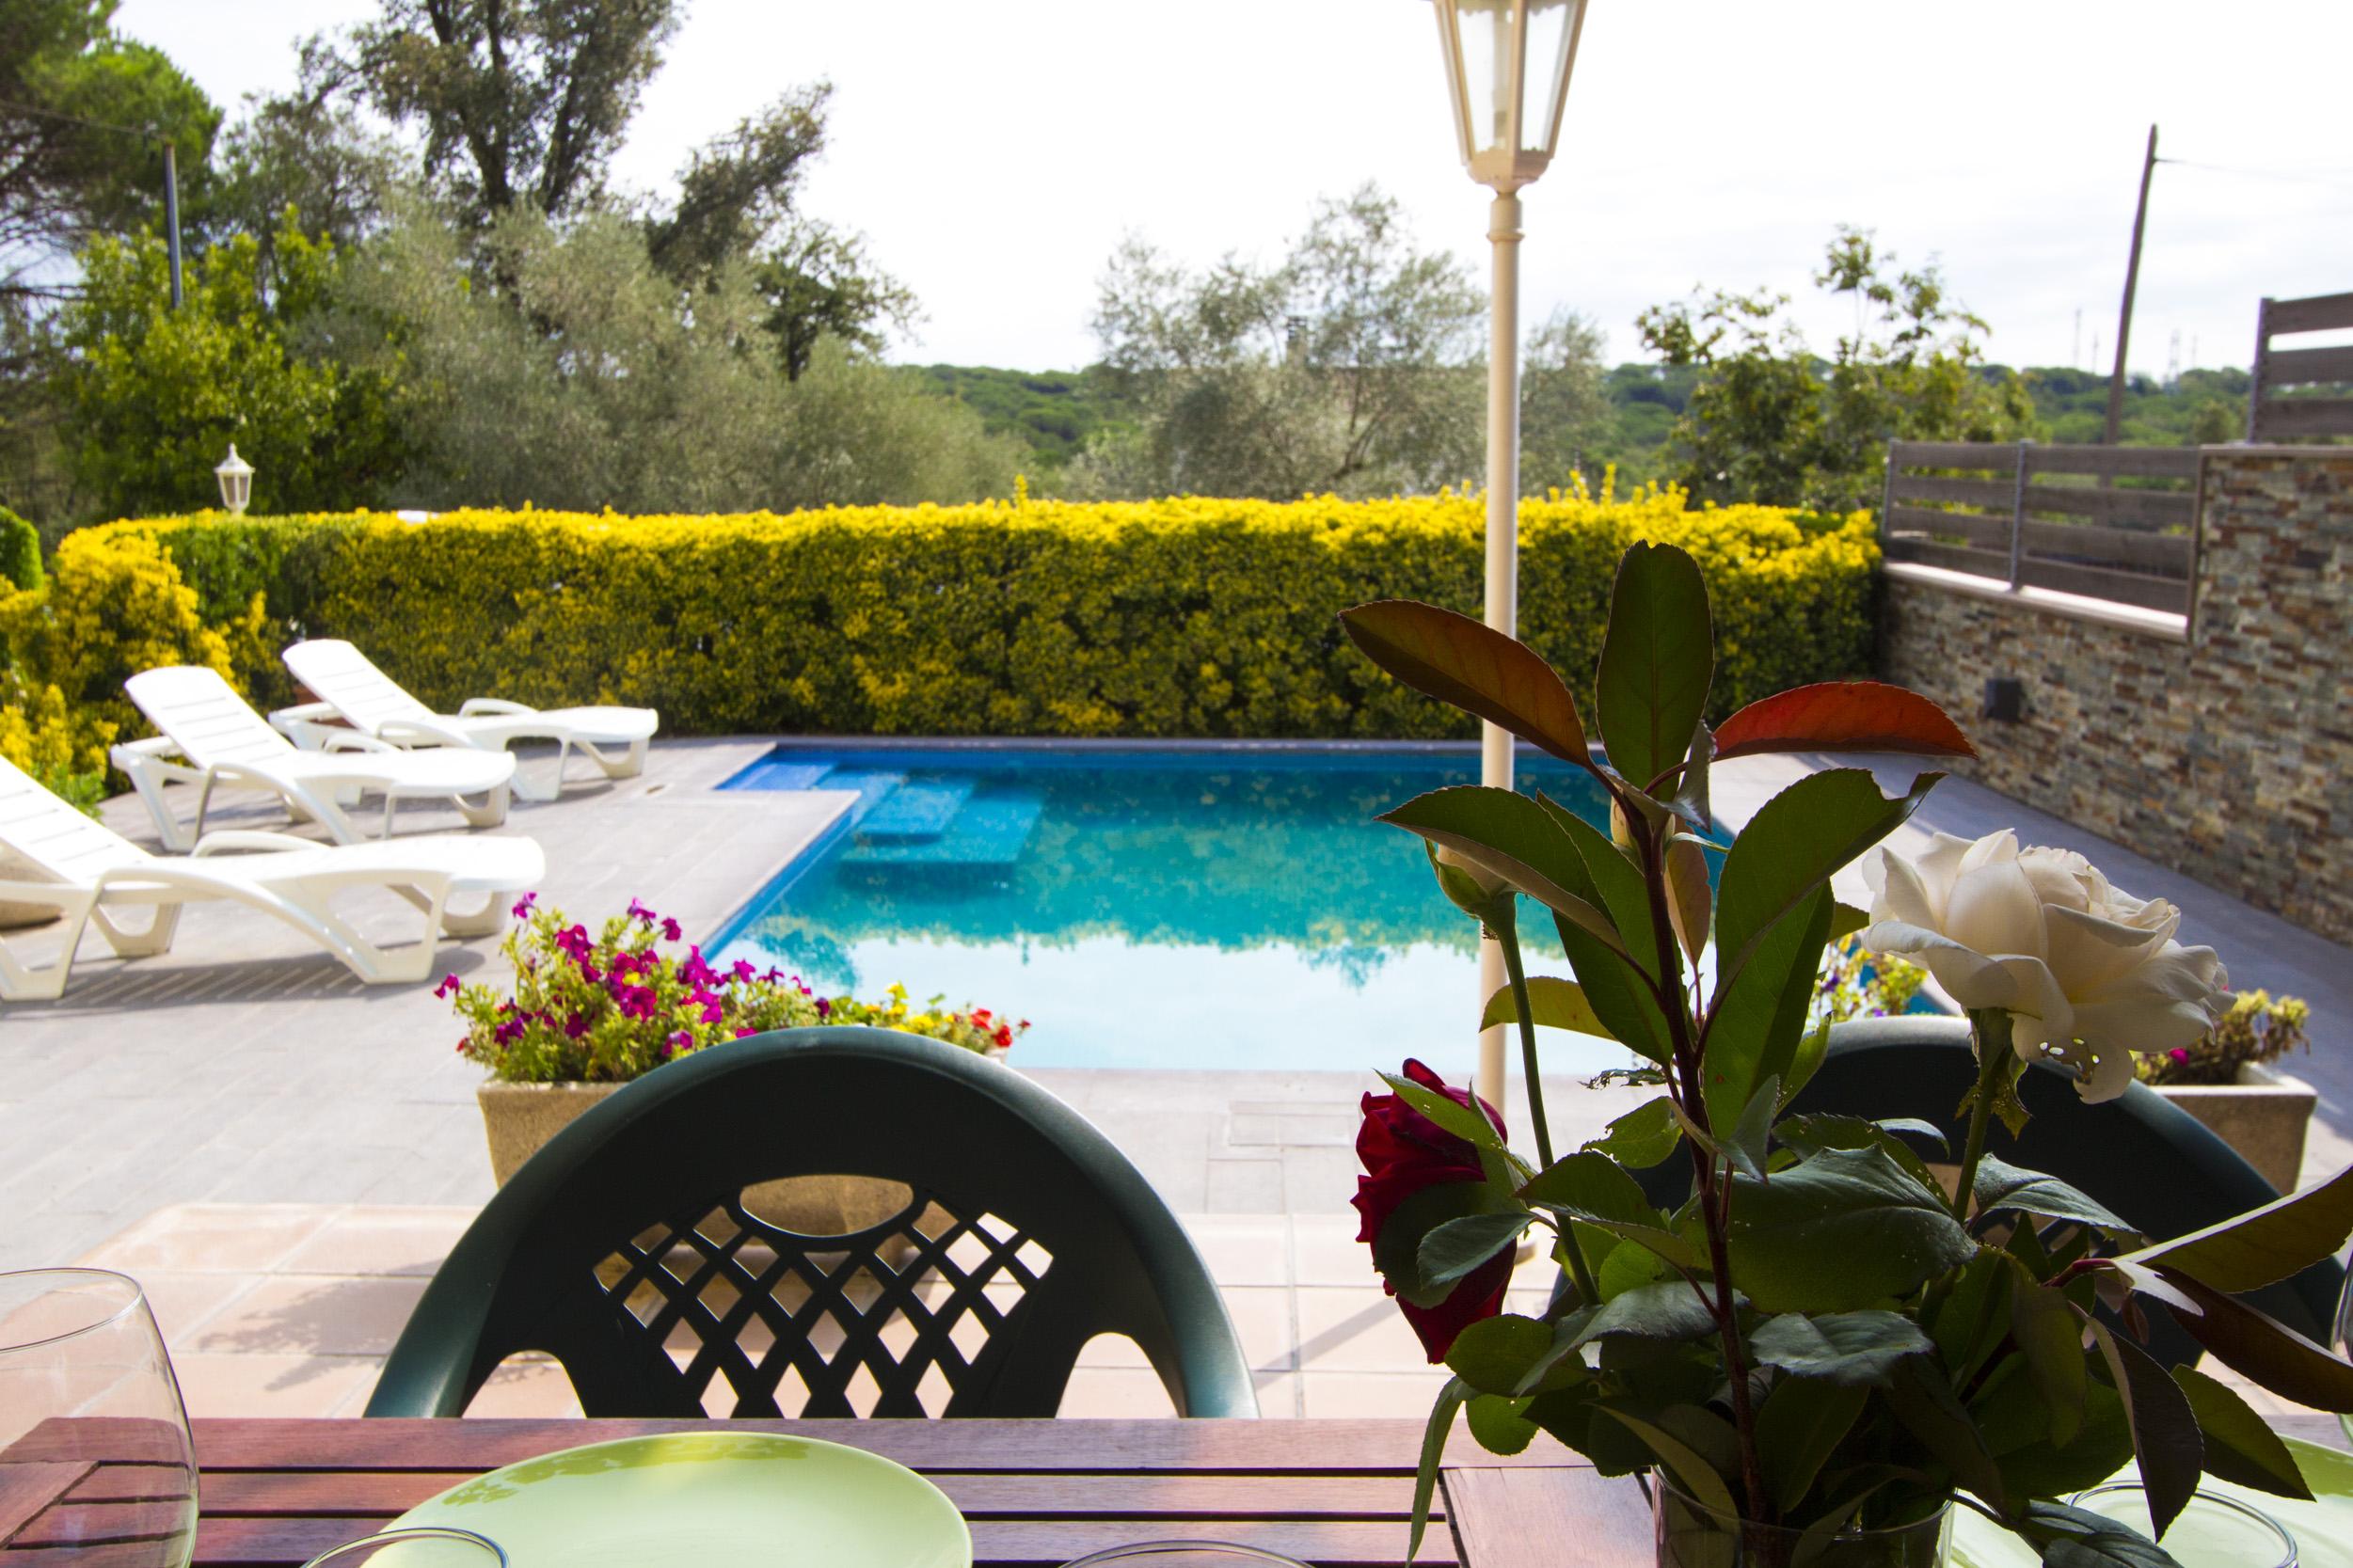 Ferienhaus Catalunya Casas: Peaceful Villa Sils, just 20 km from Costa Brava beaches! (2302155), Les Mallorquines, Girona, Katalonien, Spanien, Bild 24